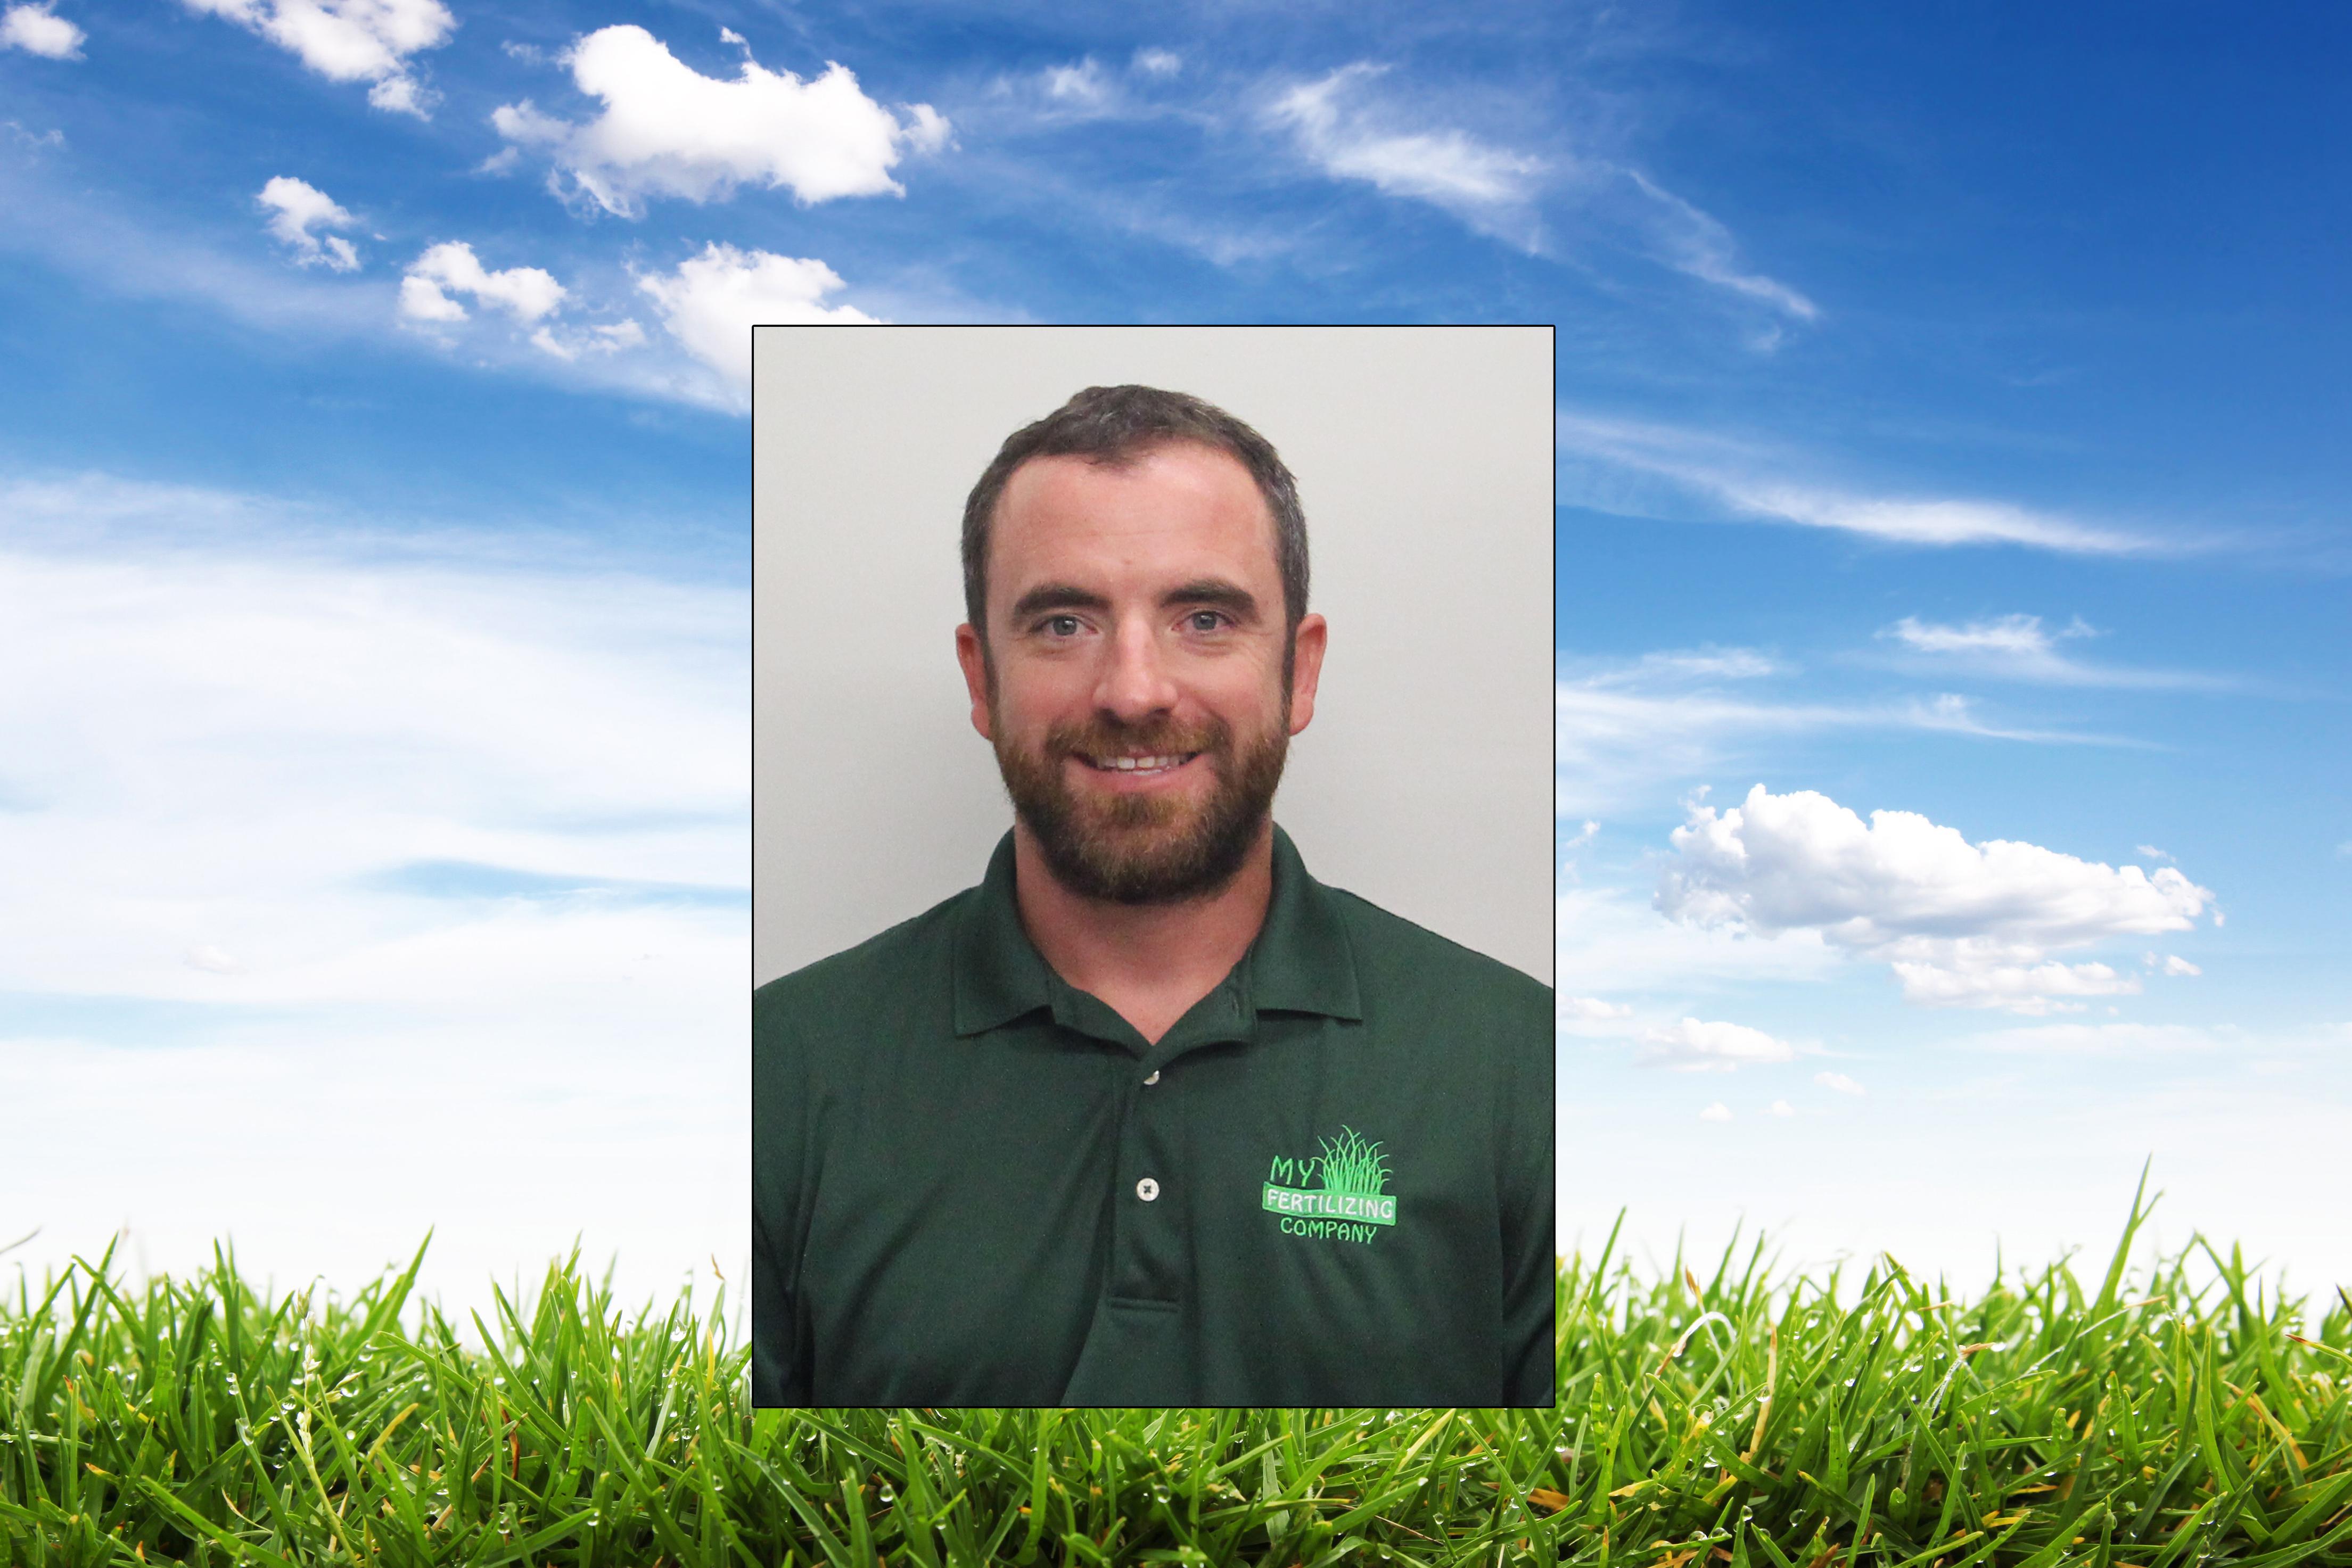 This Is An Image Of My Fertilizing Company's Matt Esper